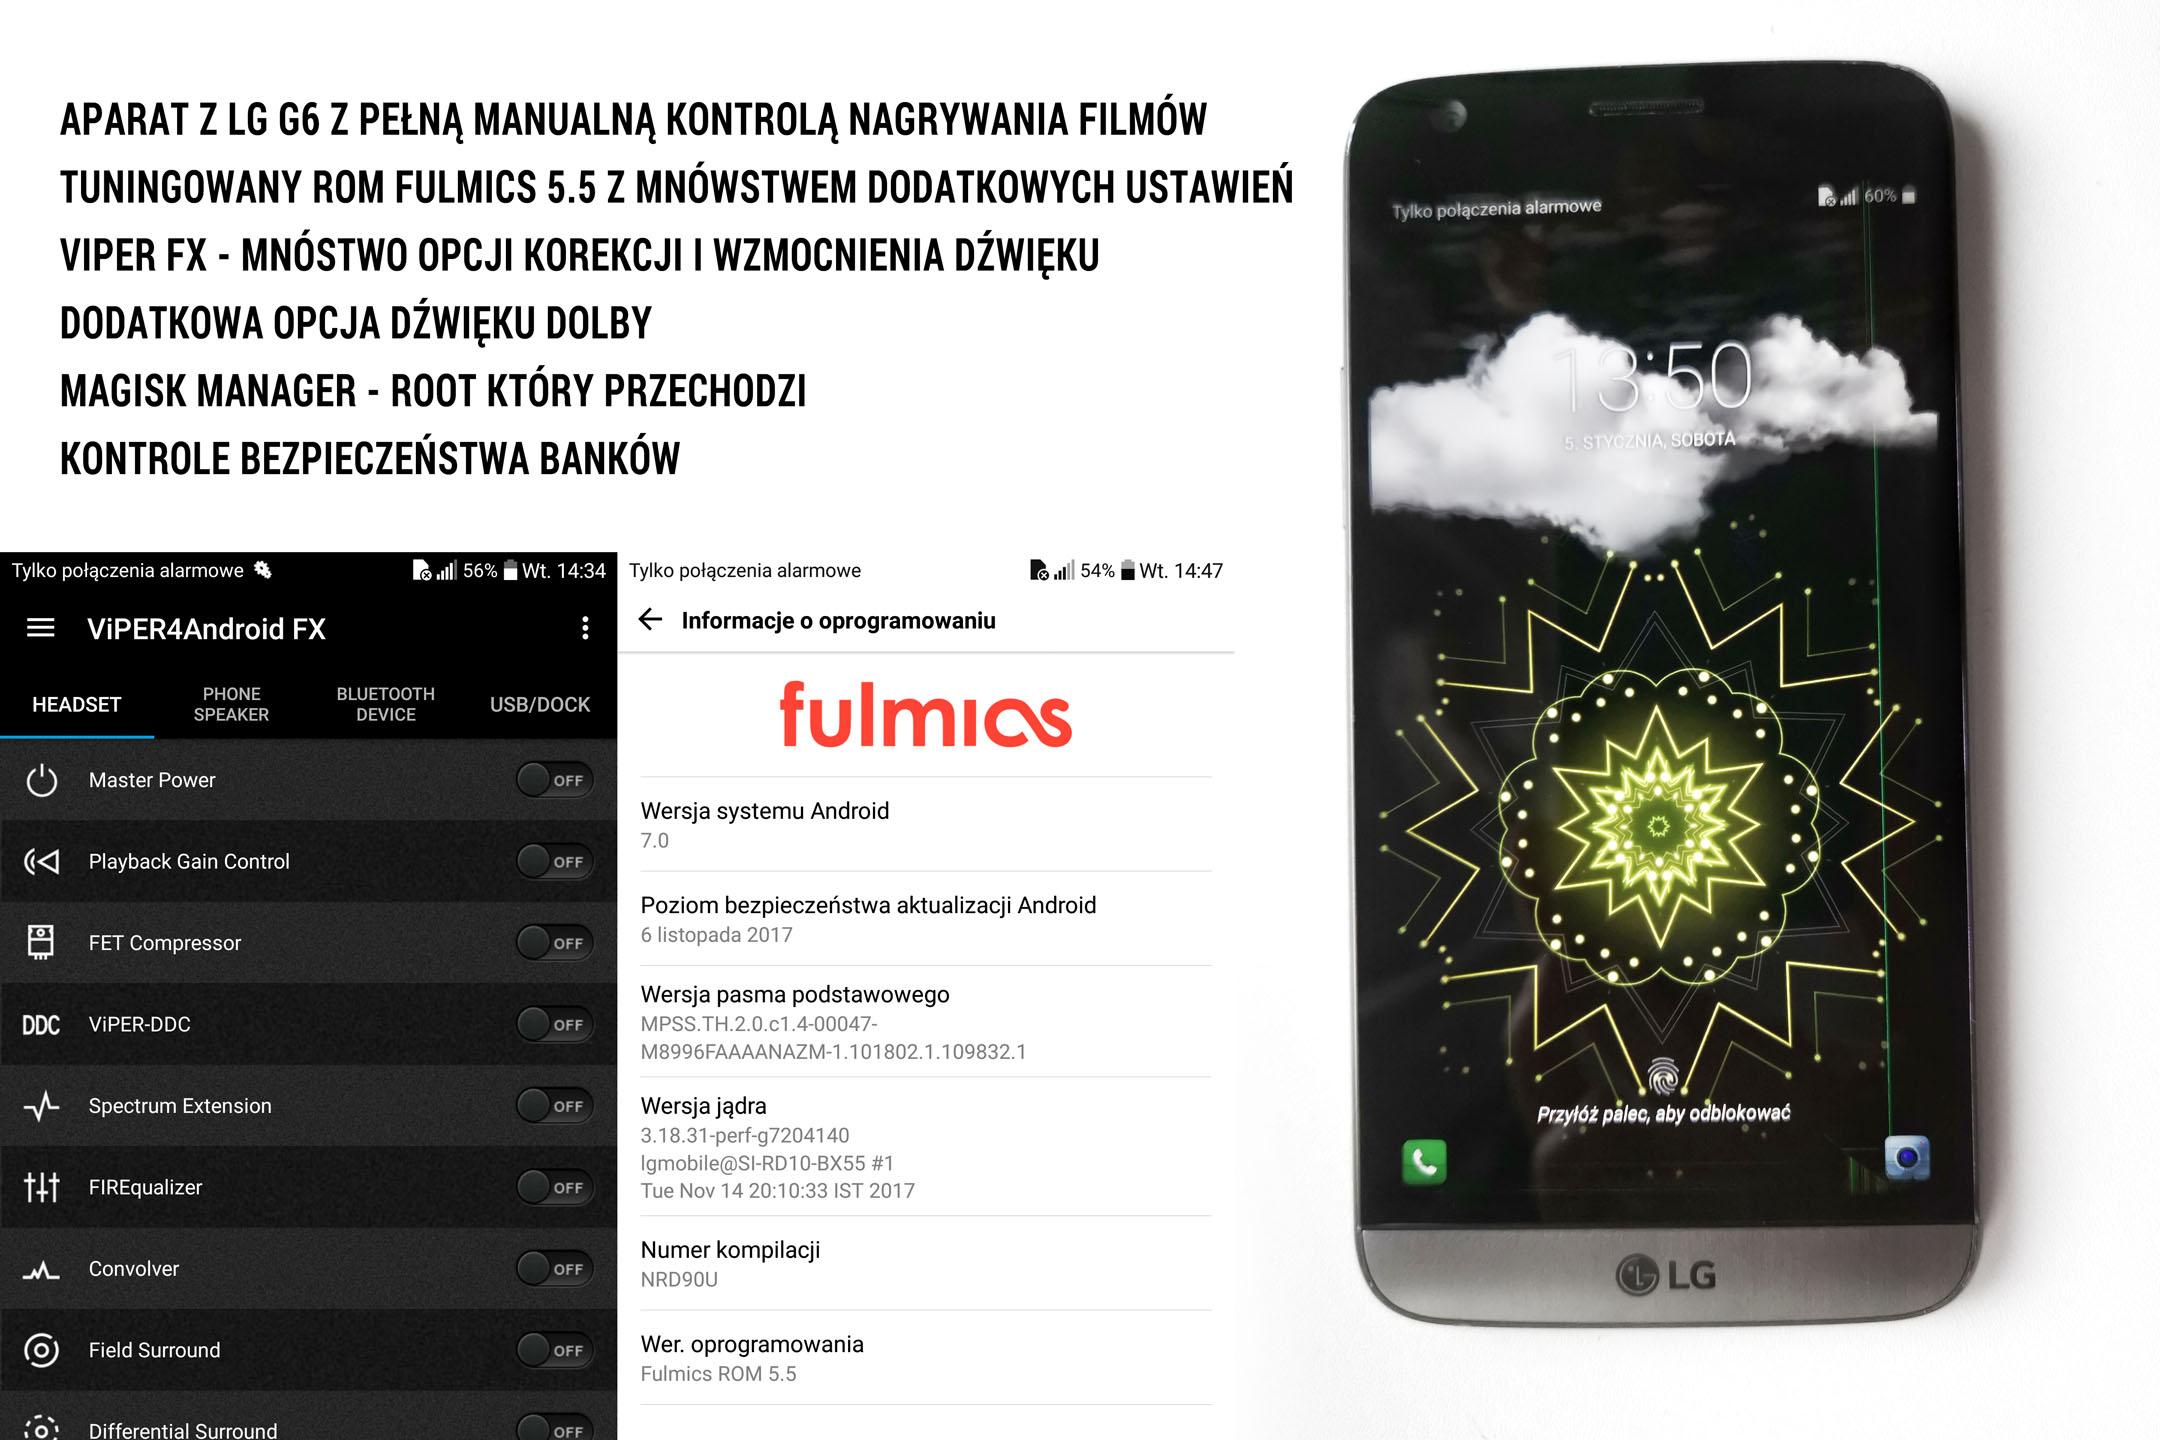 Telefon LG G5 - tuningowany - ekran do wymiany